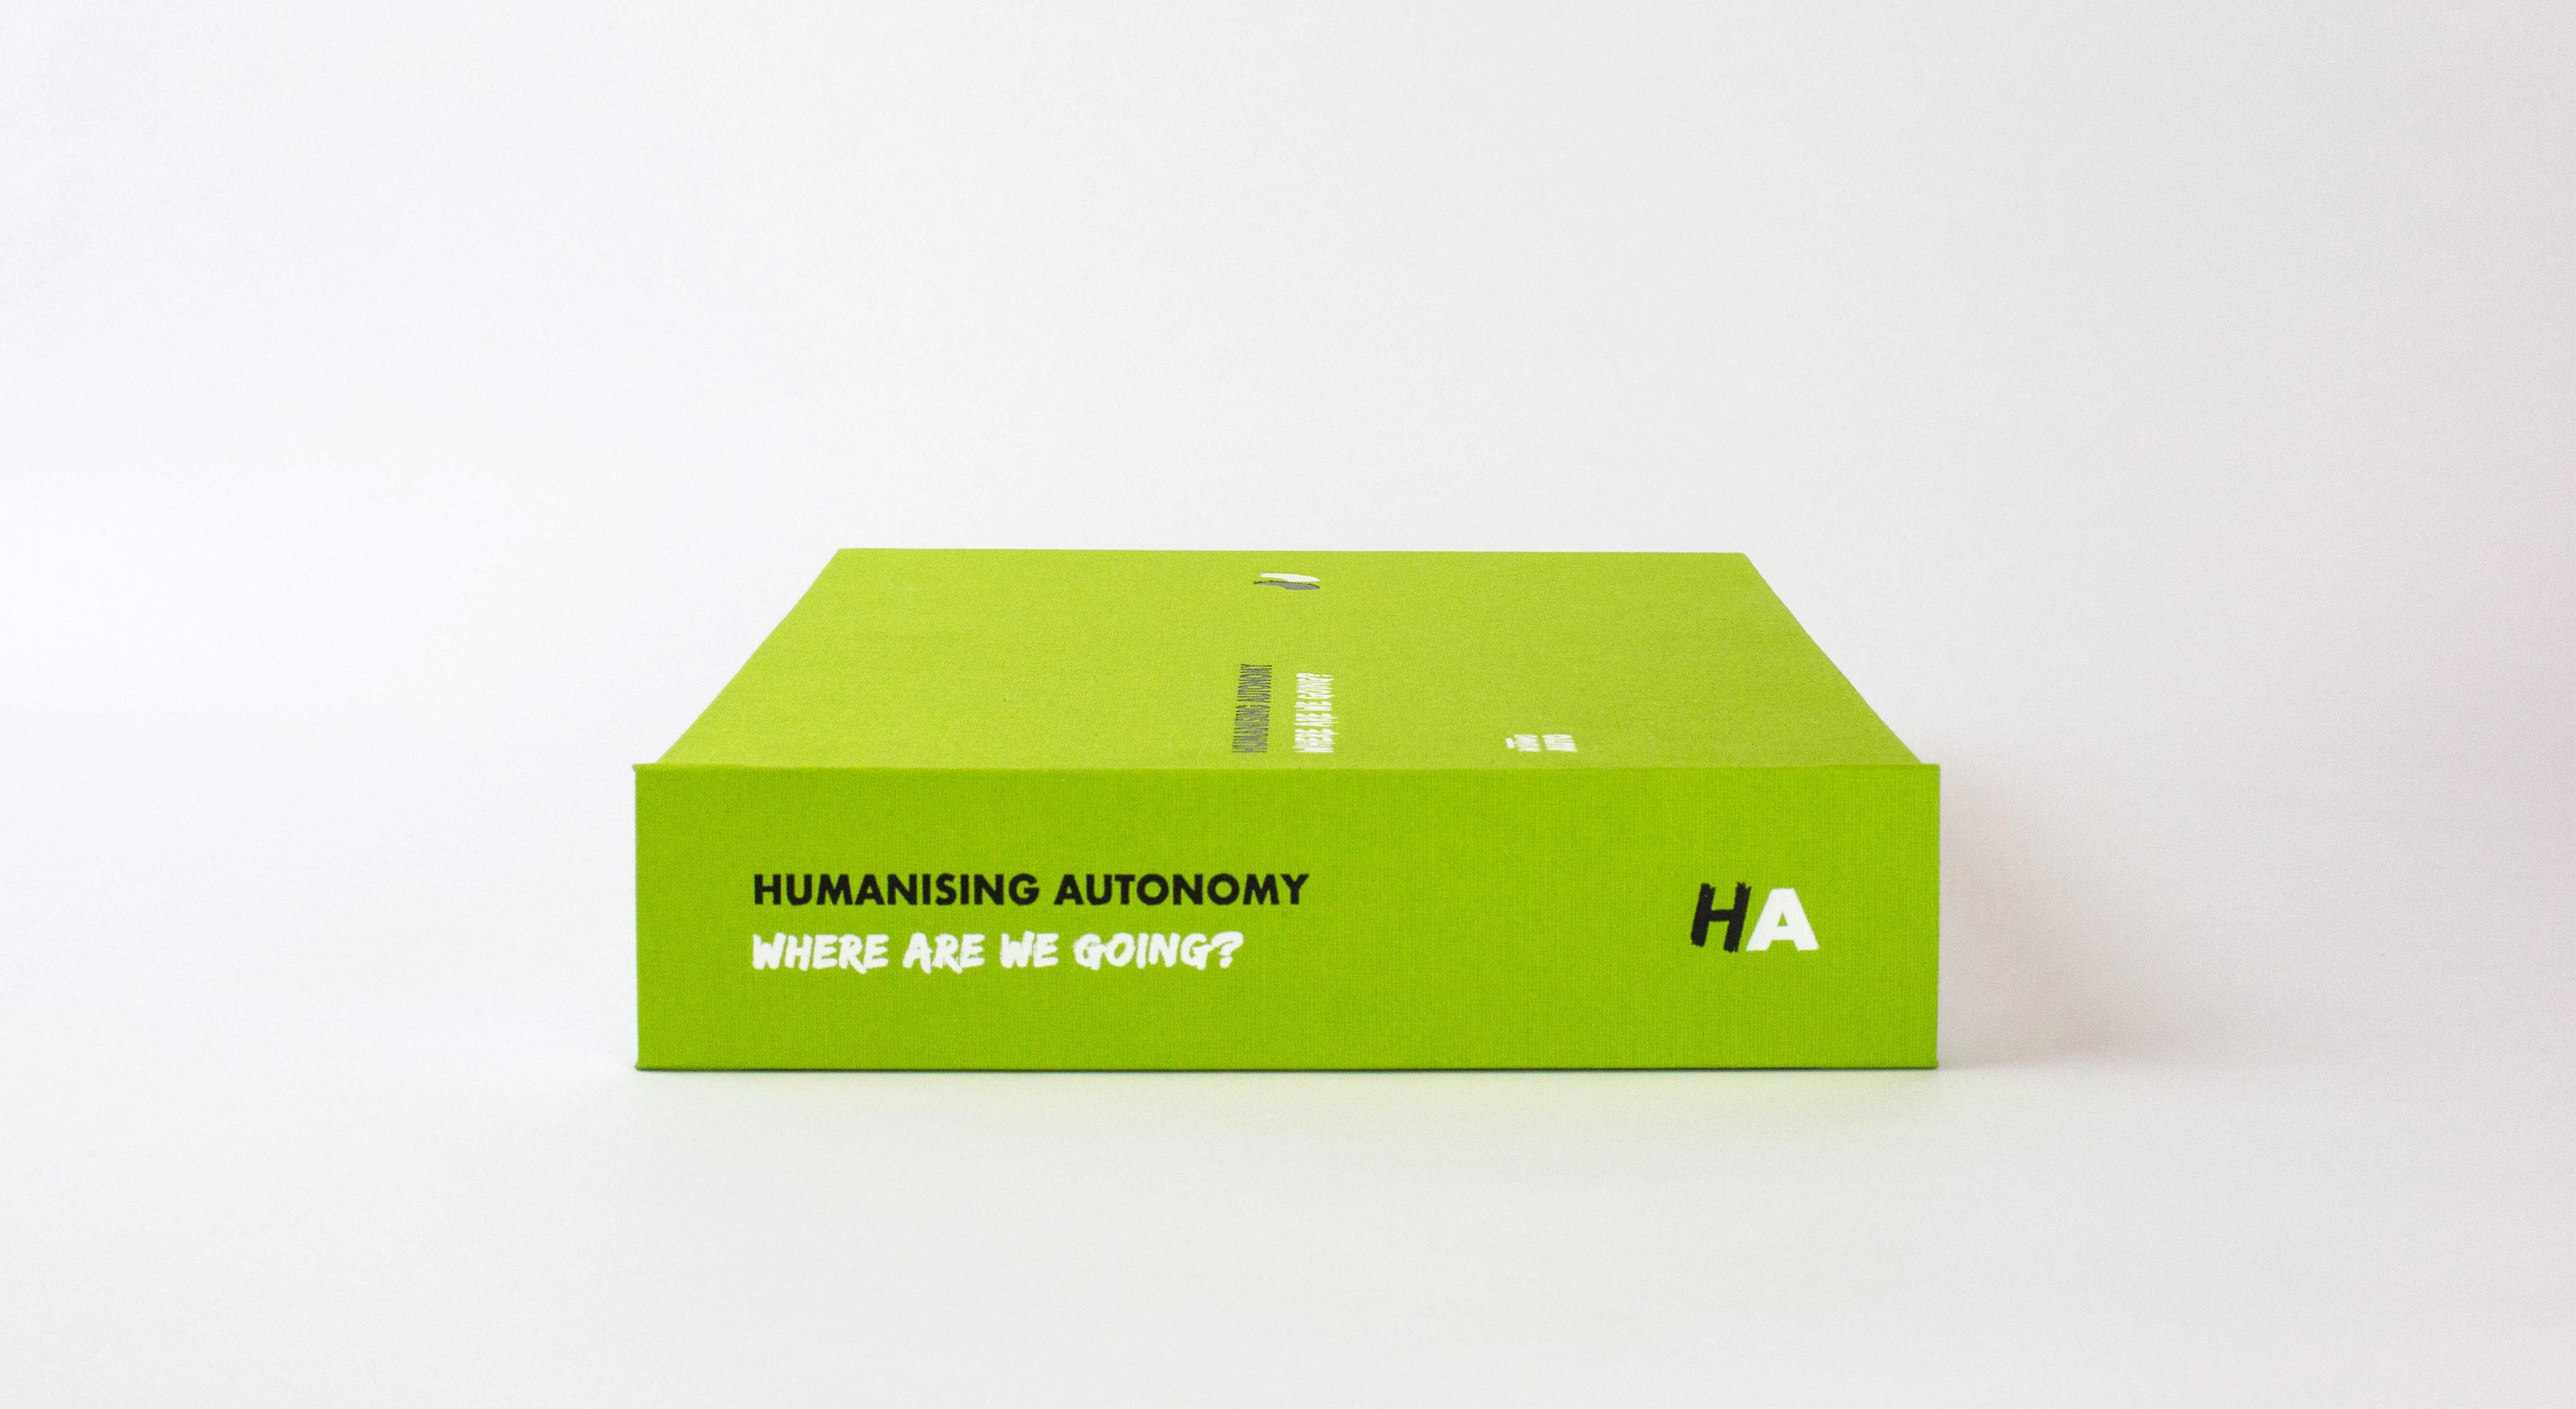 humanising-autonomy-book